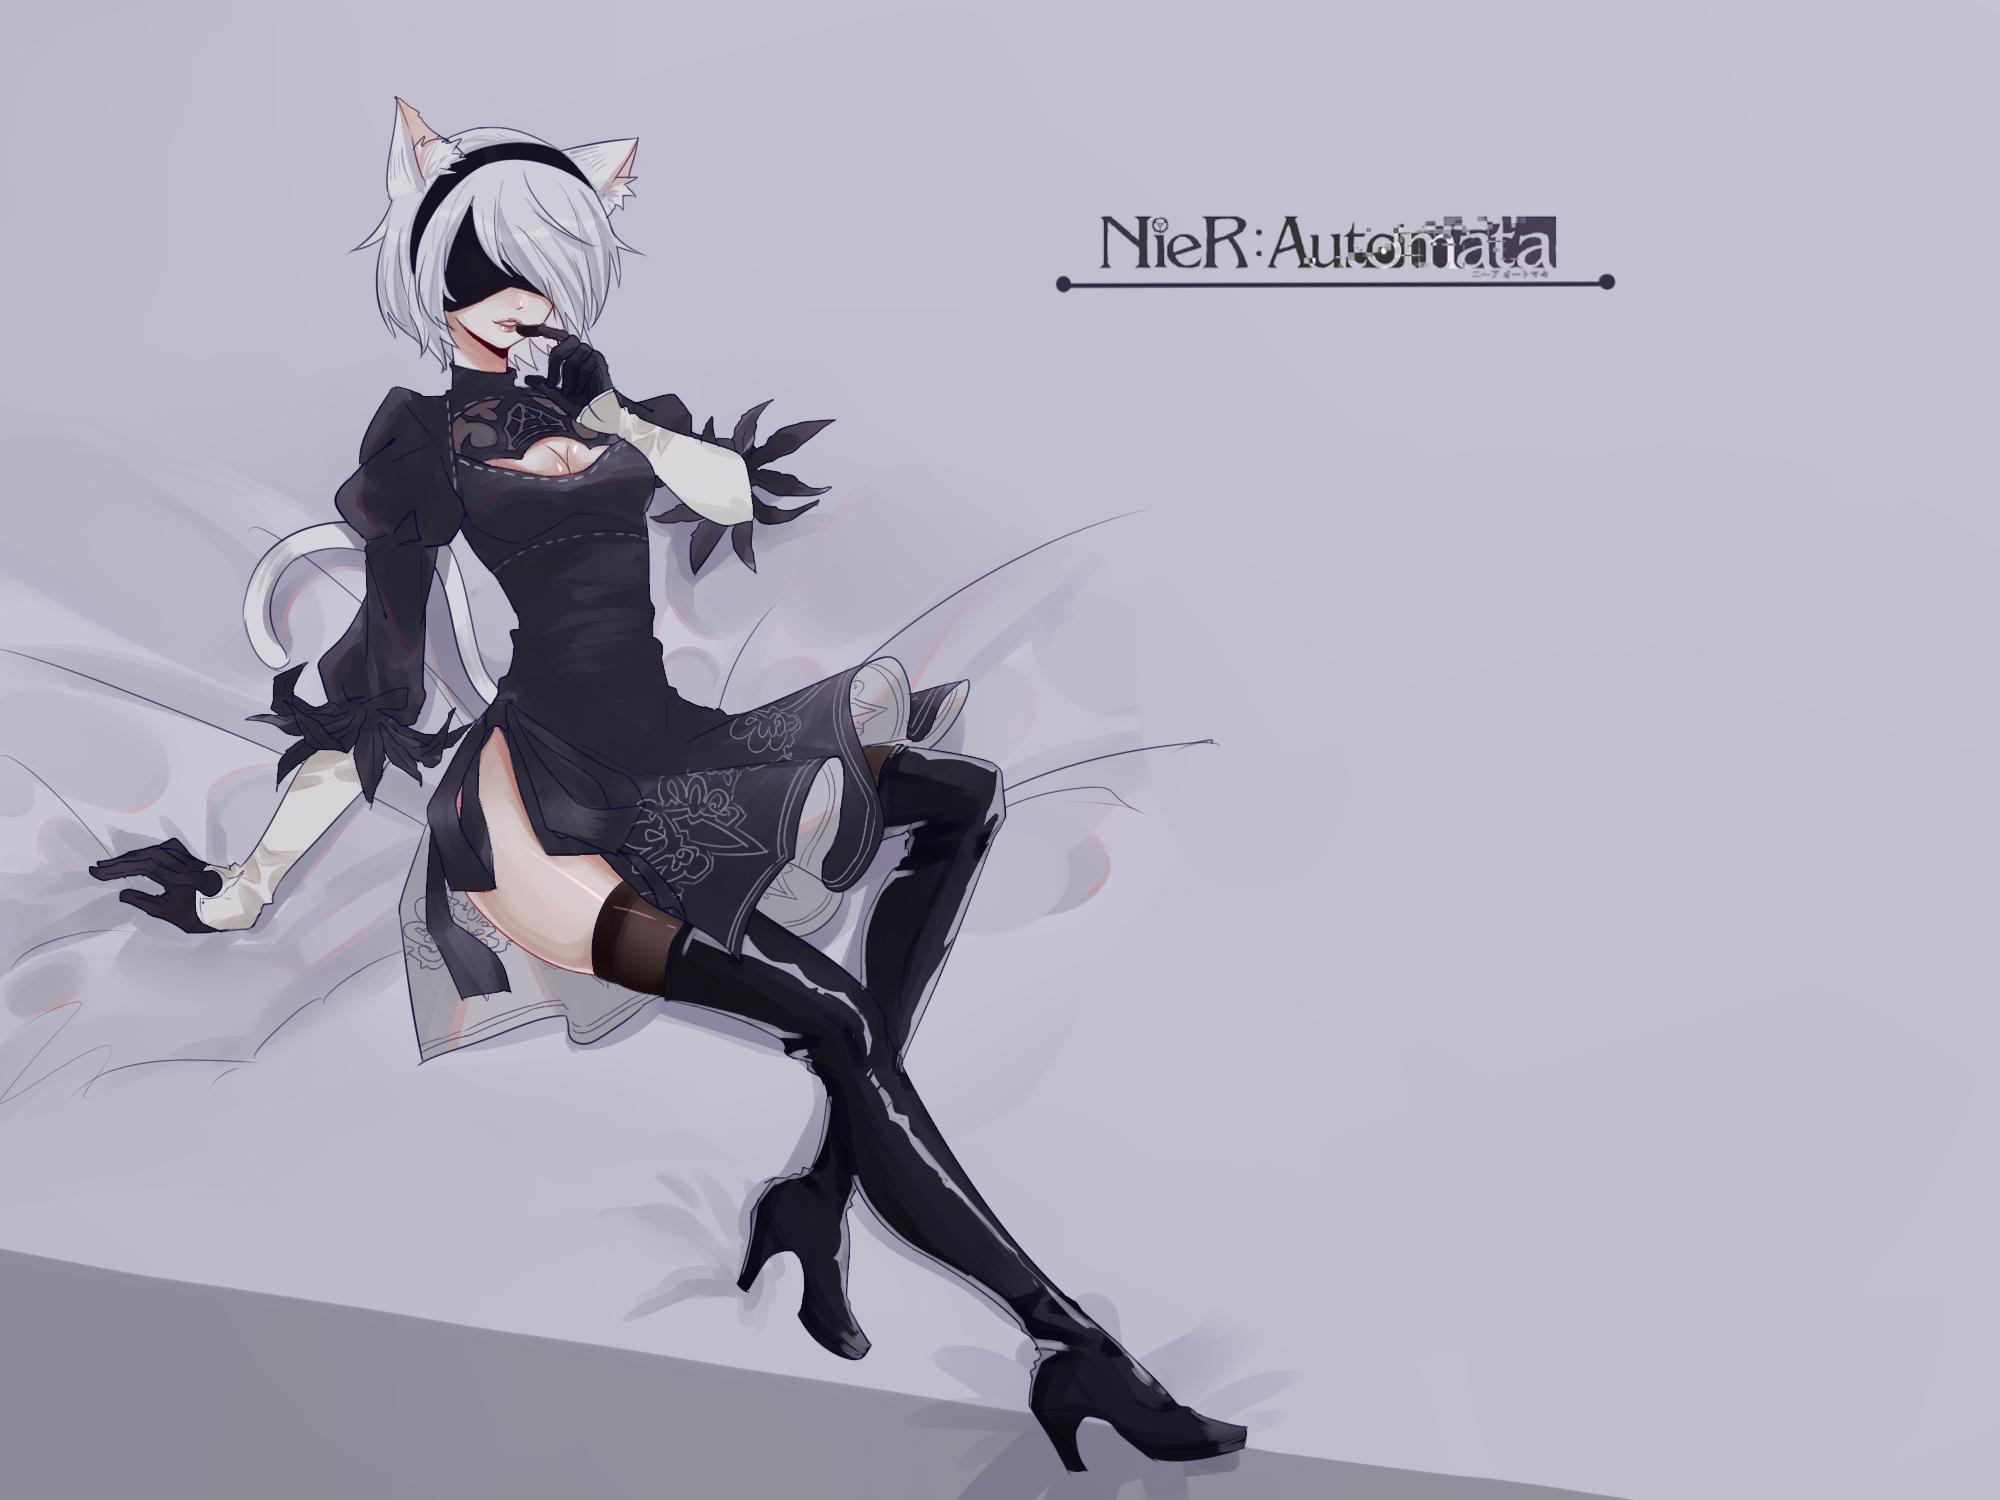 NieR-Automata-Nier-(series)-Игры-2B(YoRHa)-3744431.png - NieR: Automata